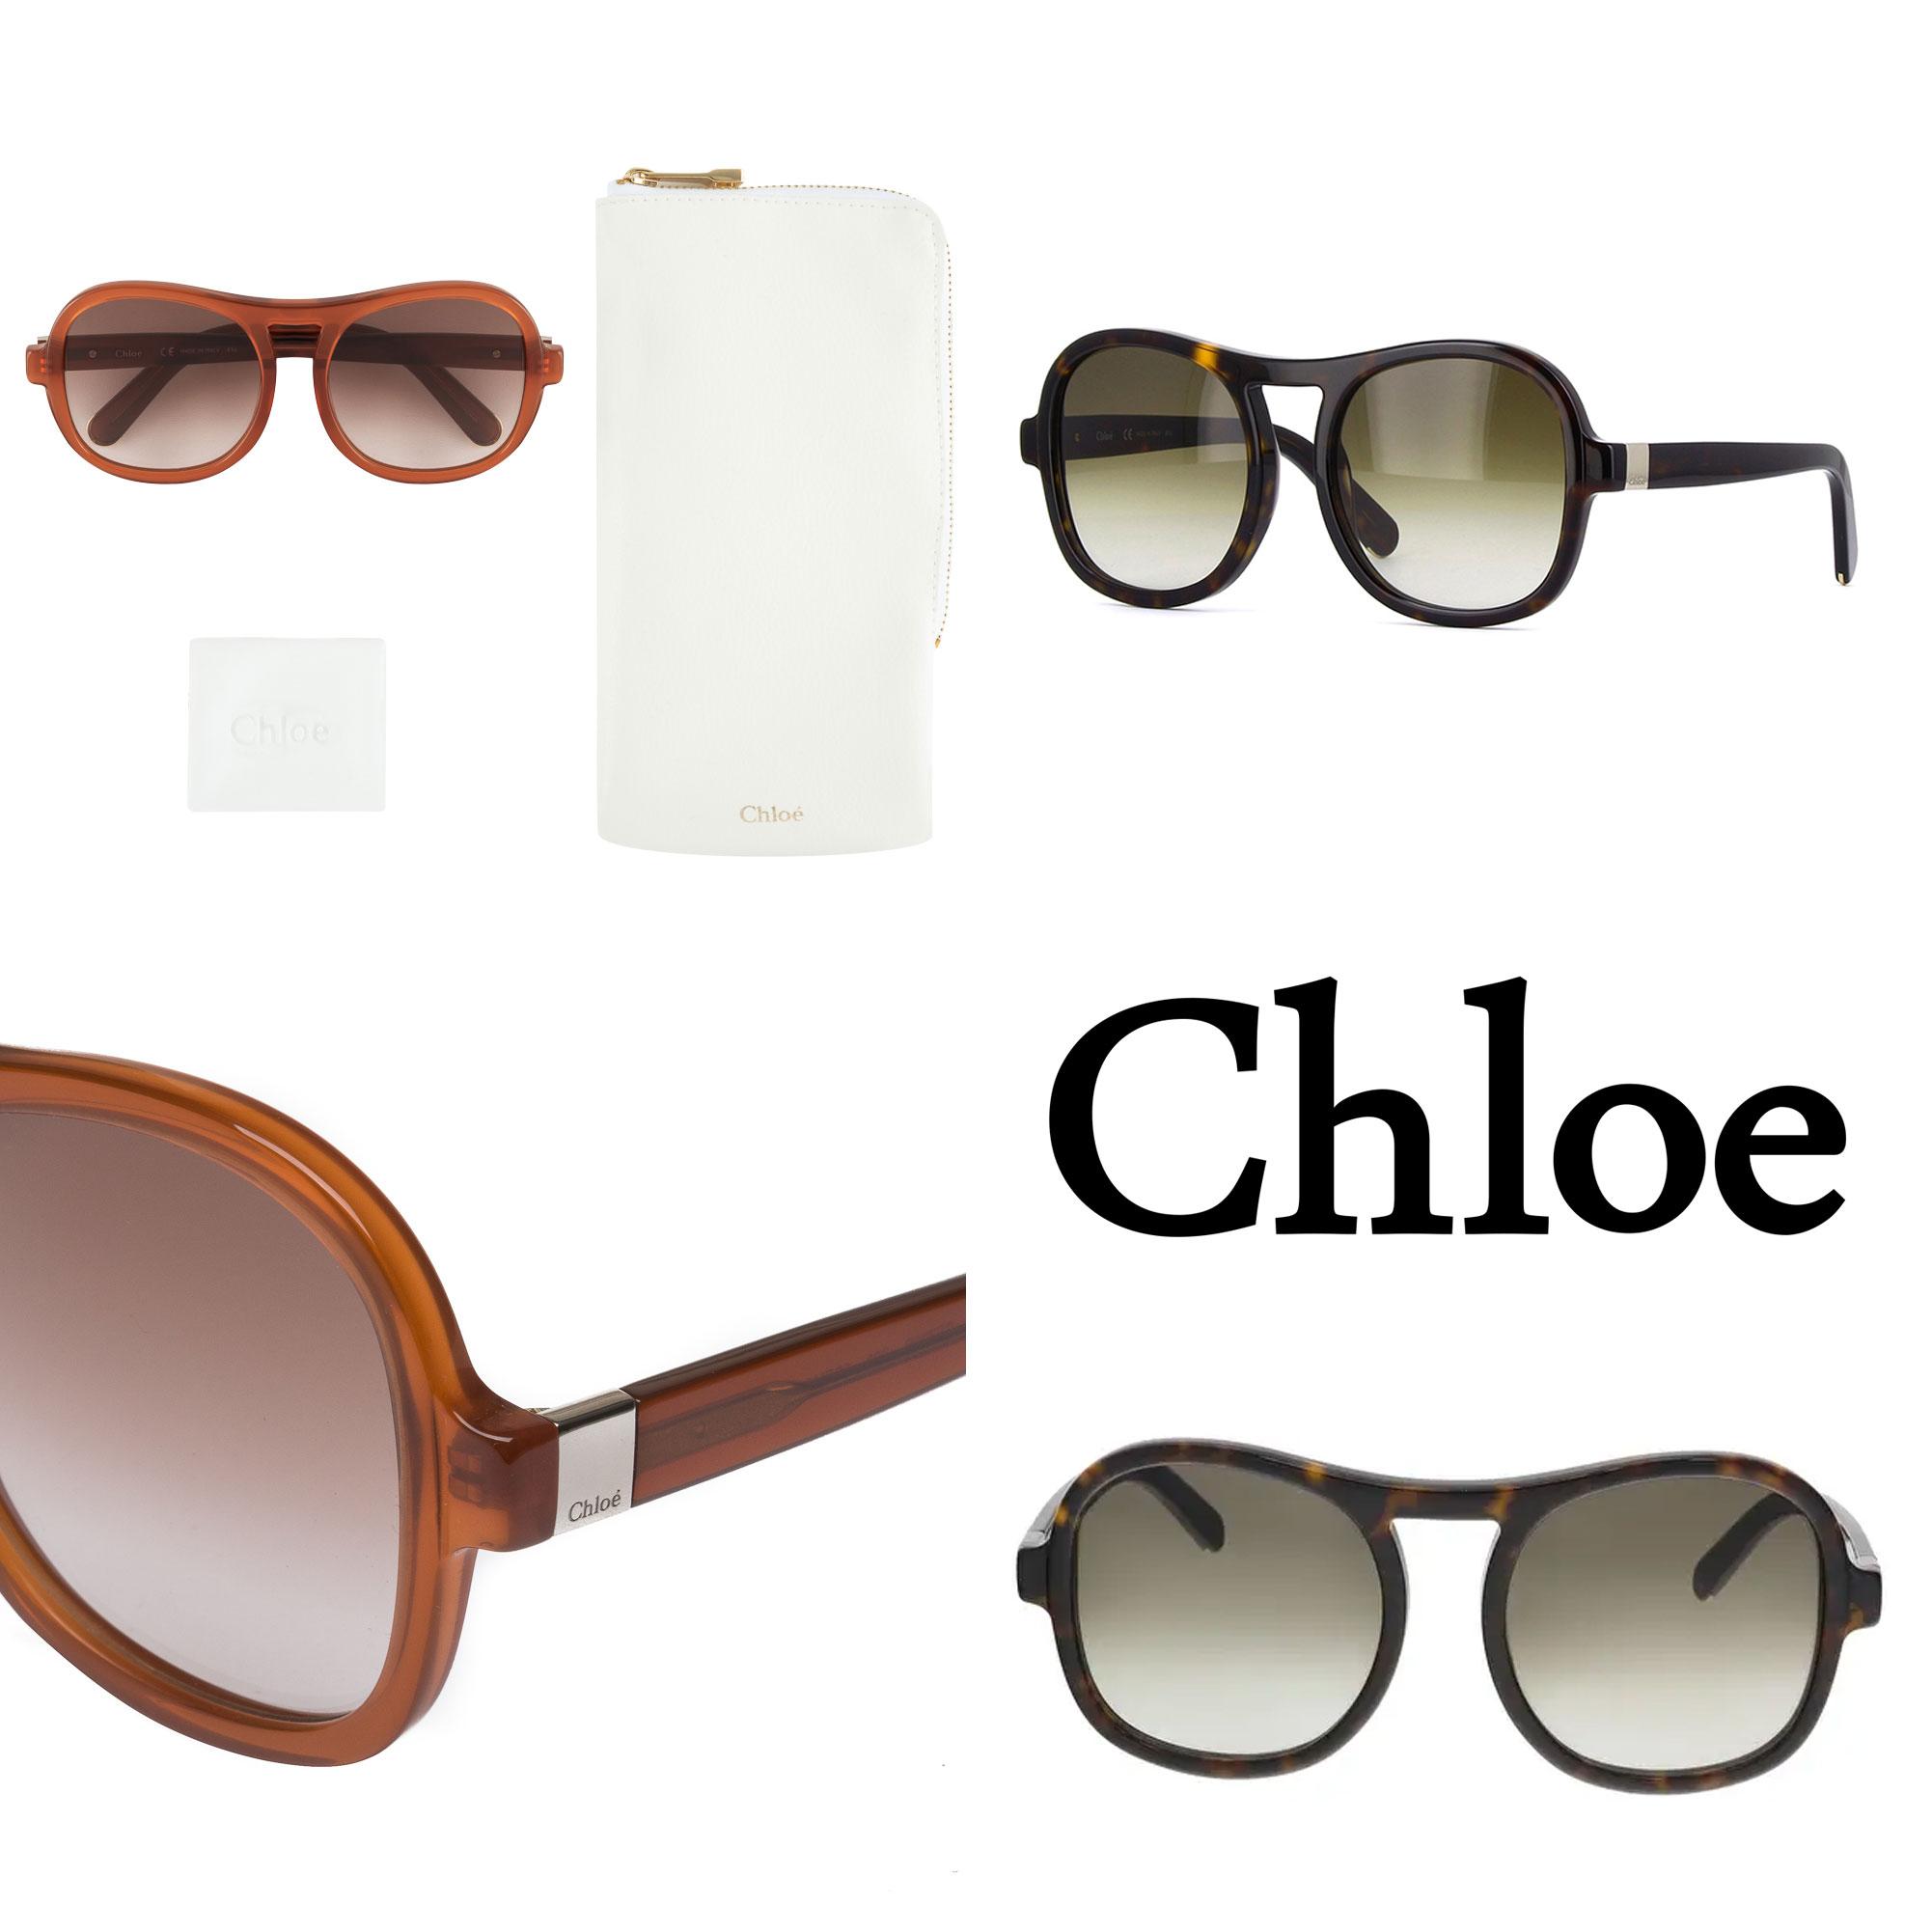 Chloé dames zonnebril @ Sport-Korting